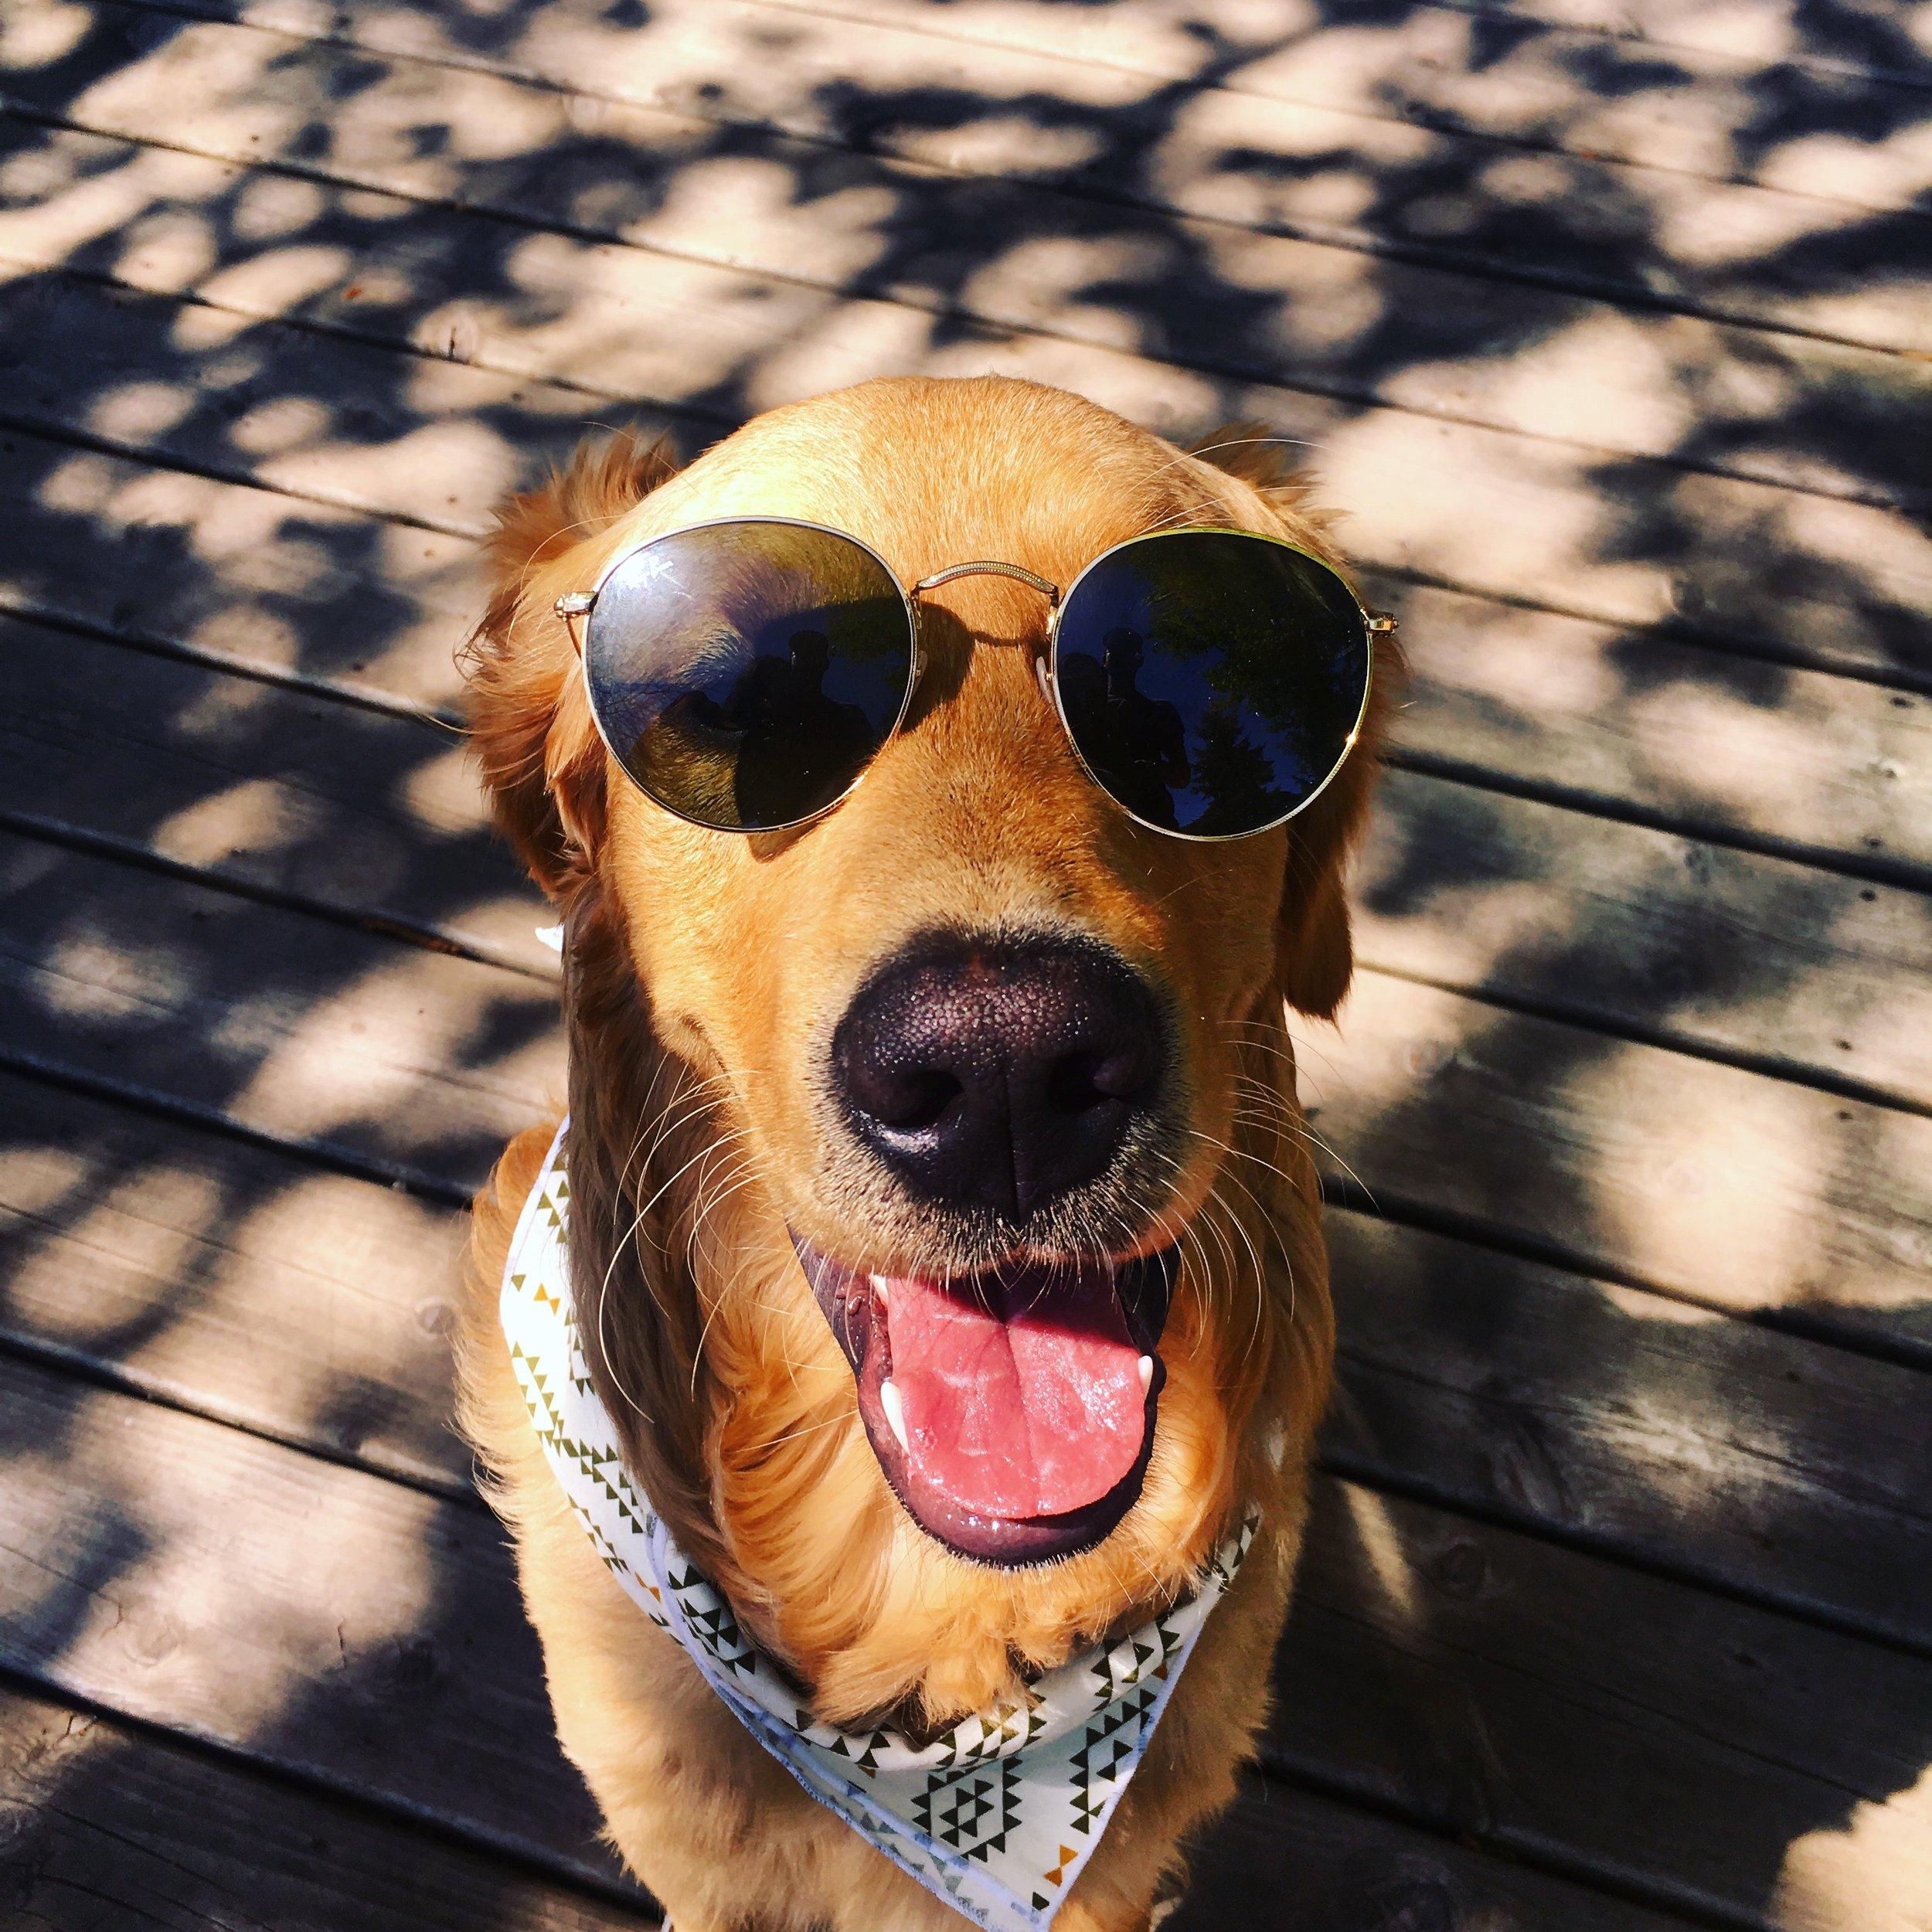 Dog_Bandana_White_Green_Aztec_Print_SUNDAYS_Sunglasses.JPG